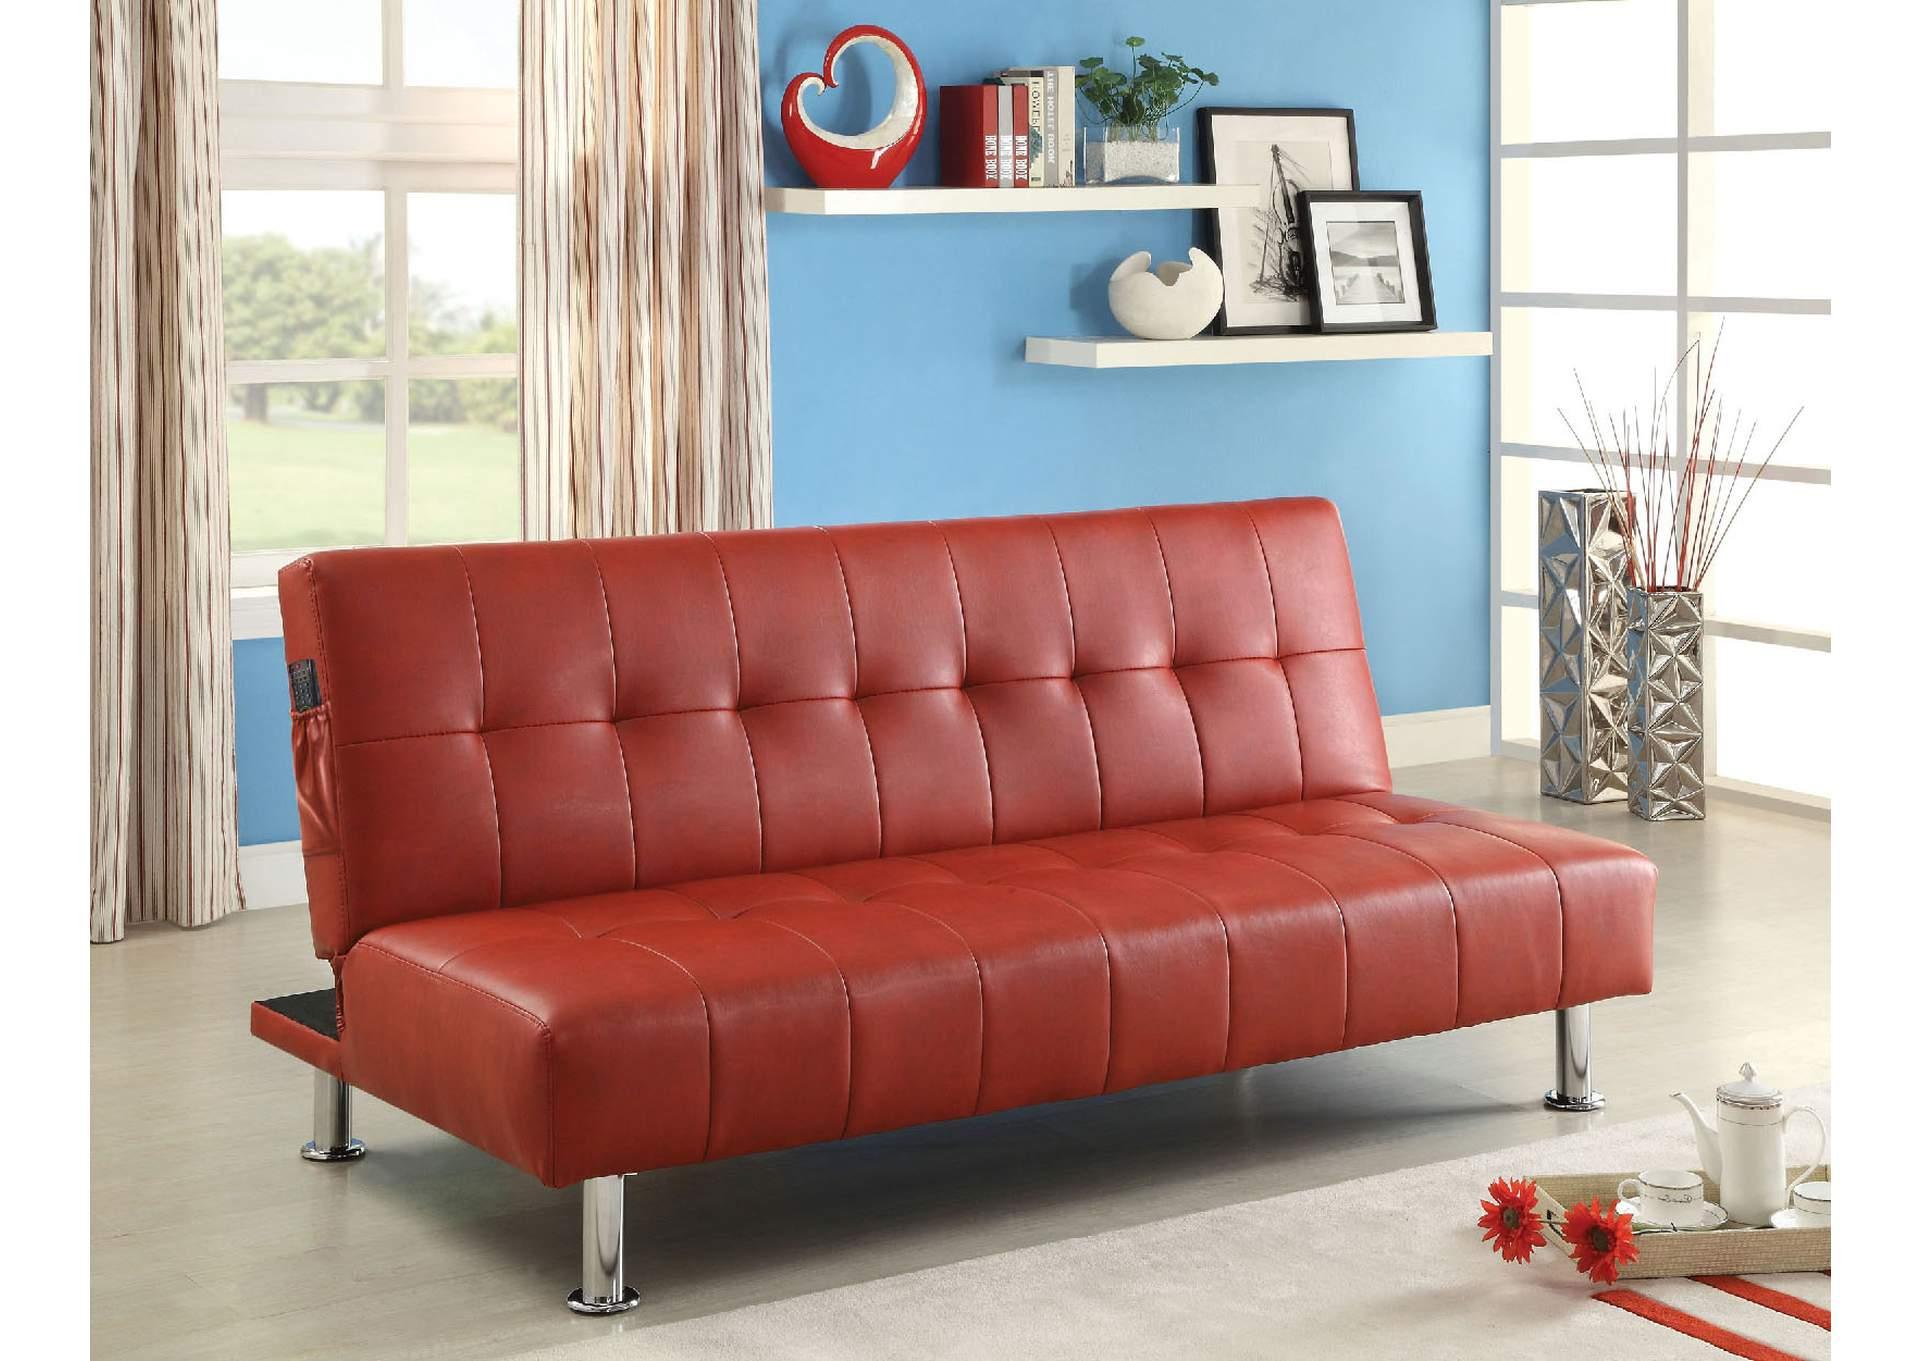 Bulle Red Leatherette Futon Sofa,Furniture Of America